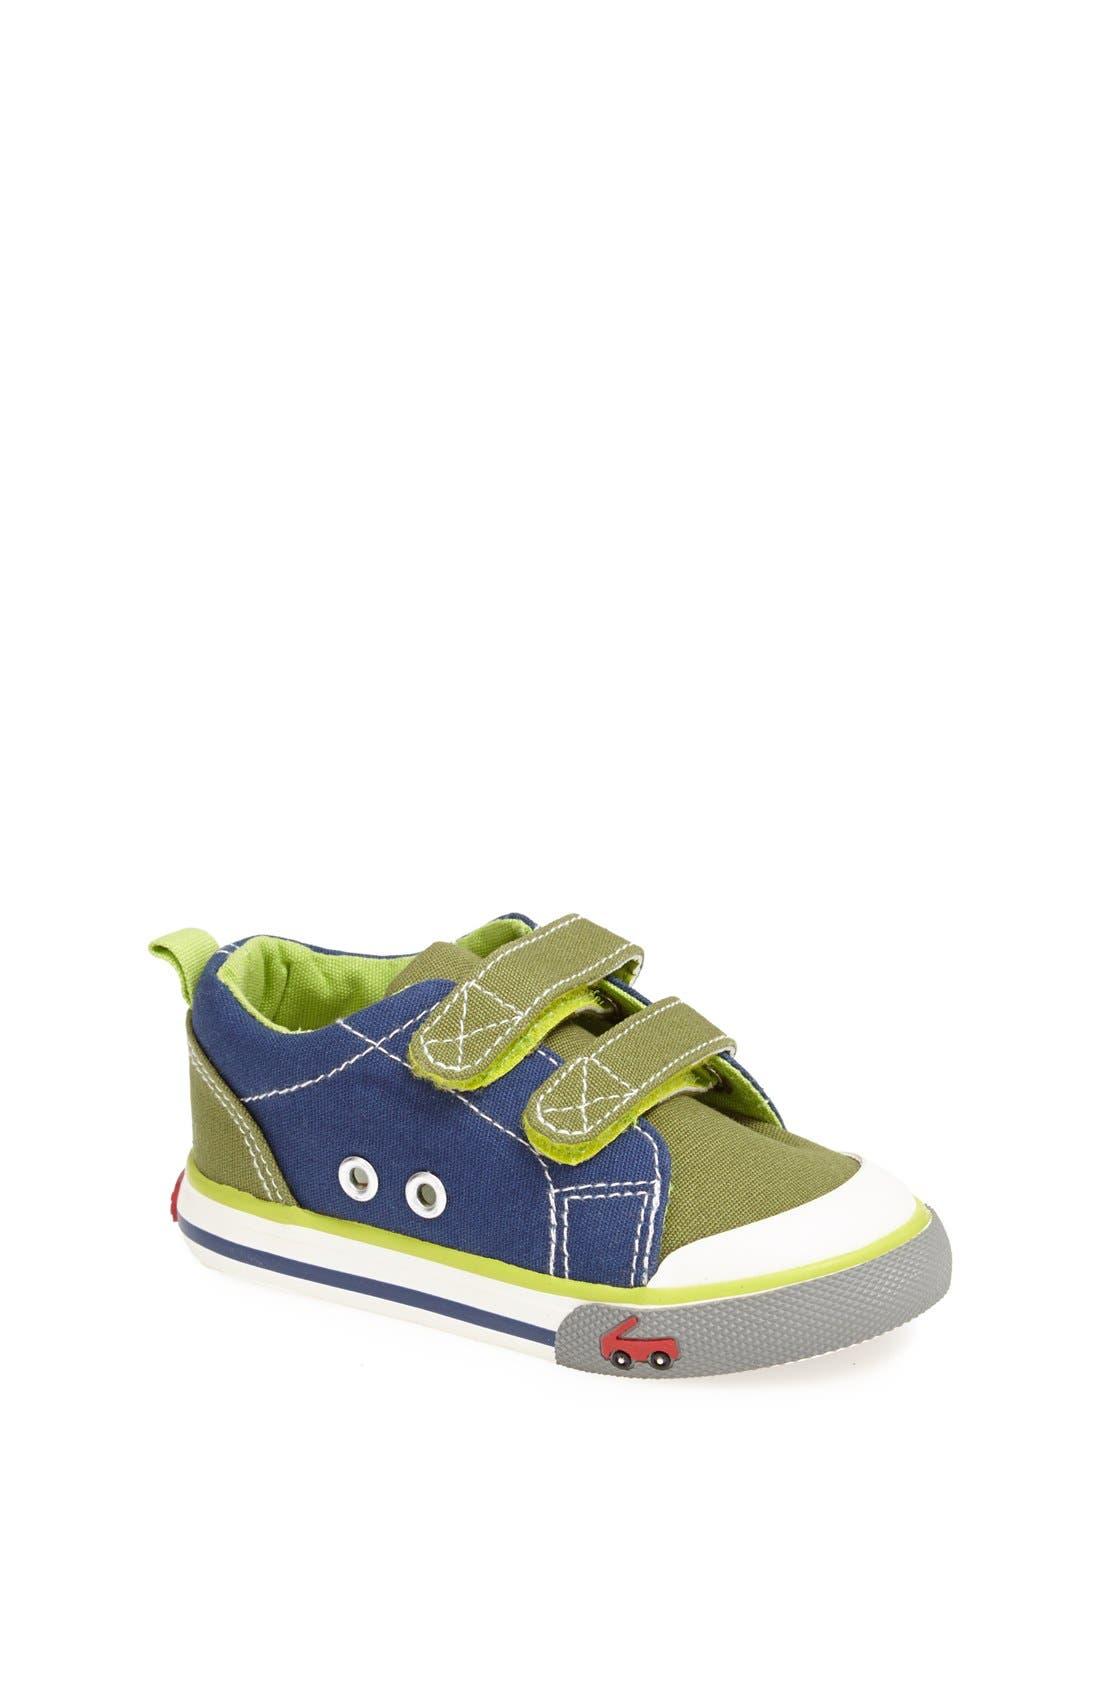 Main Image - See Kai Run 'Nakoa' Sneaker (Baby, Walker & Toddler)